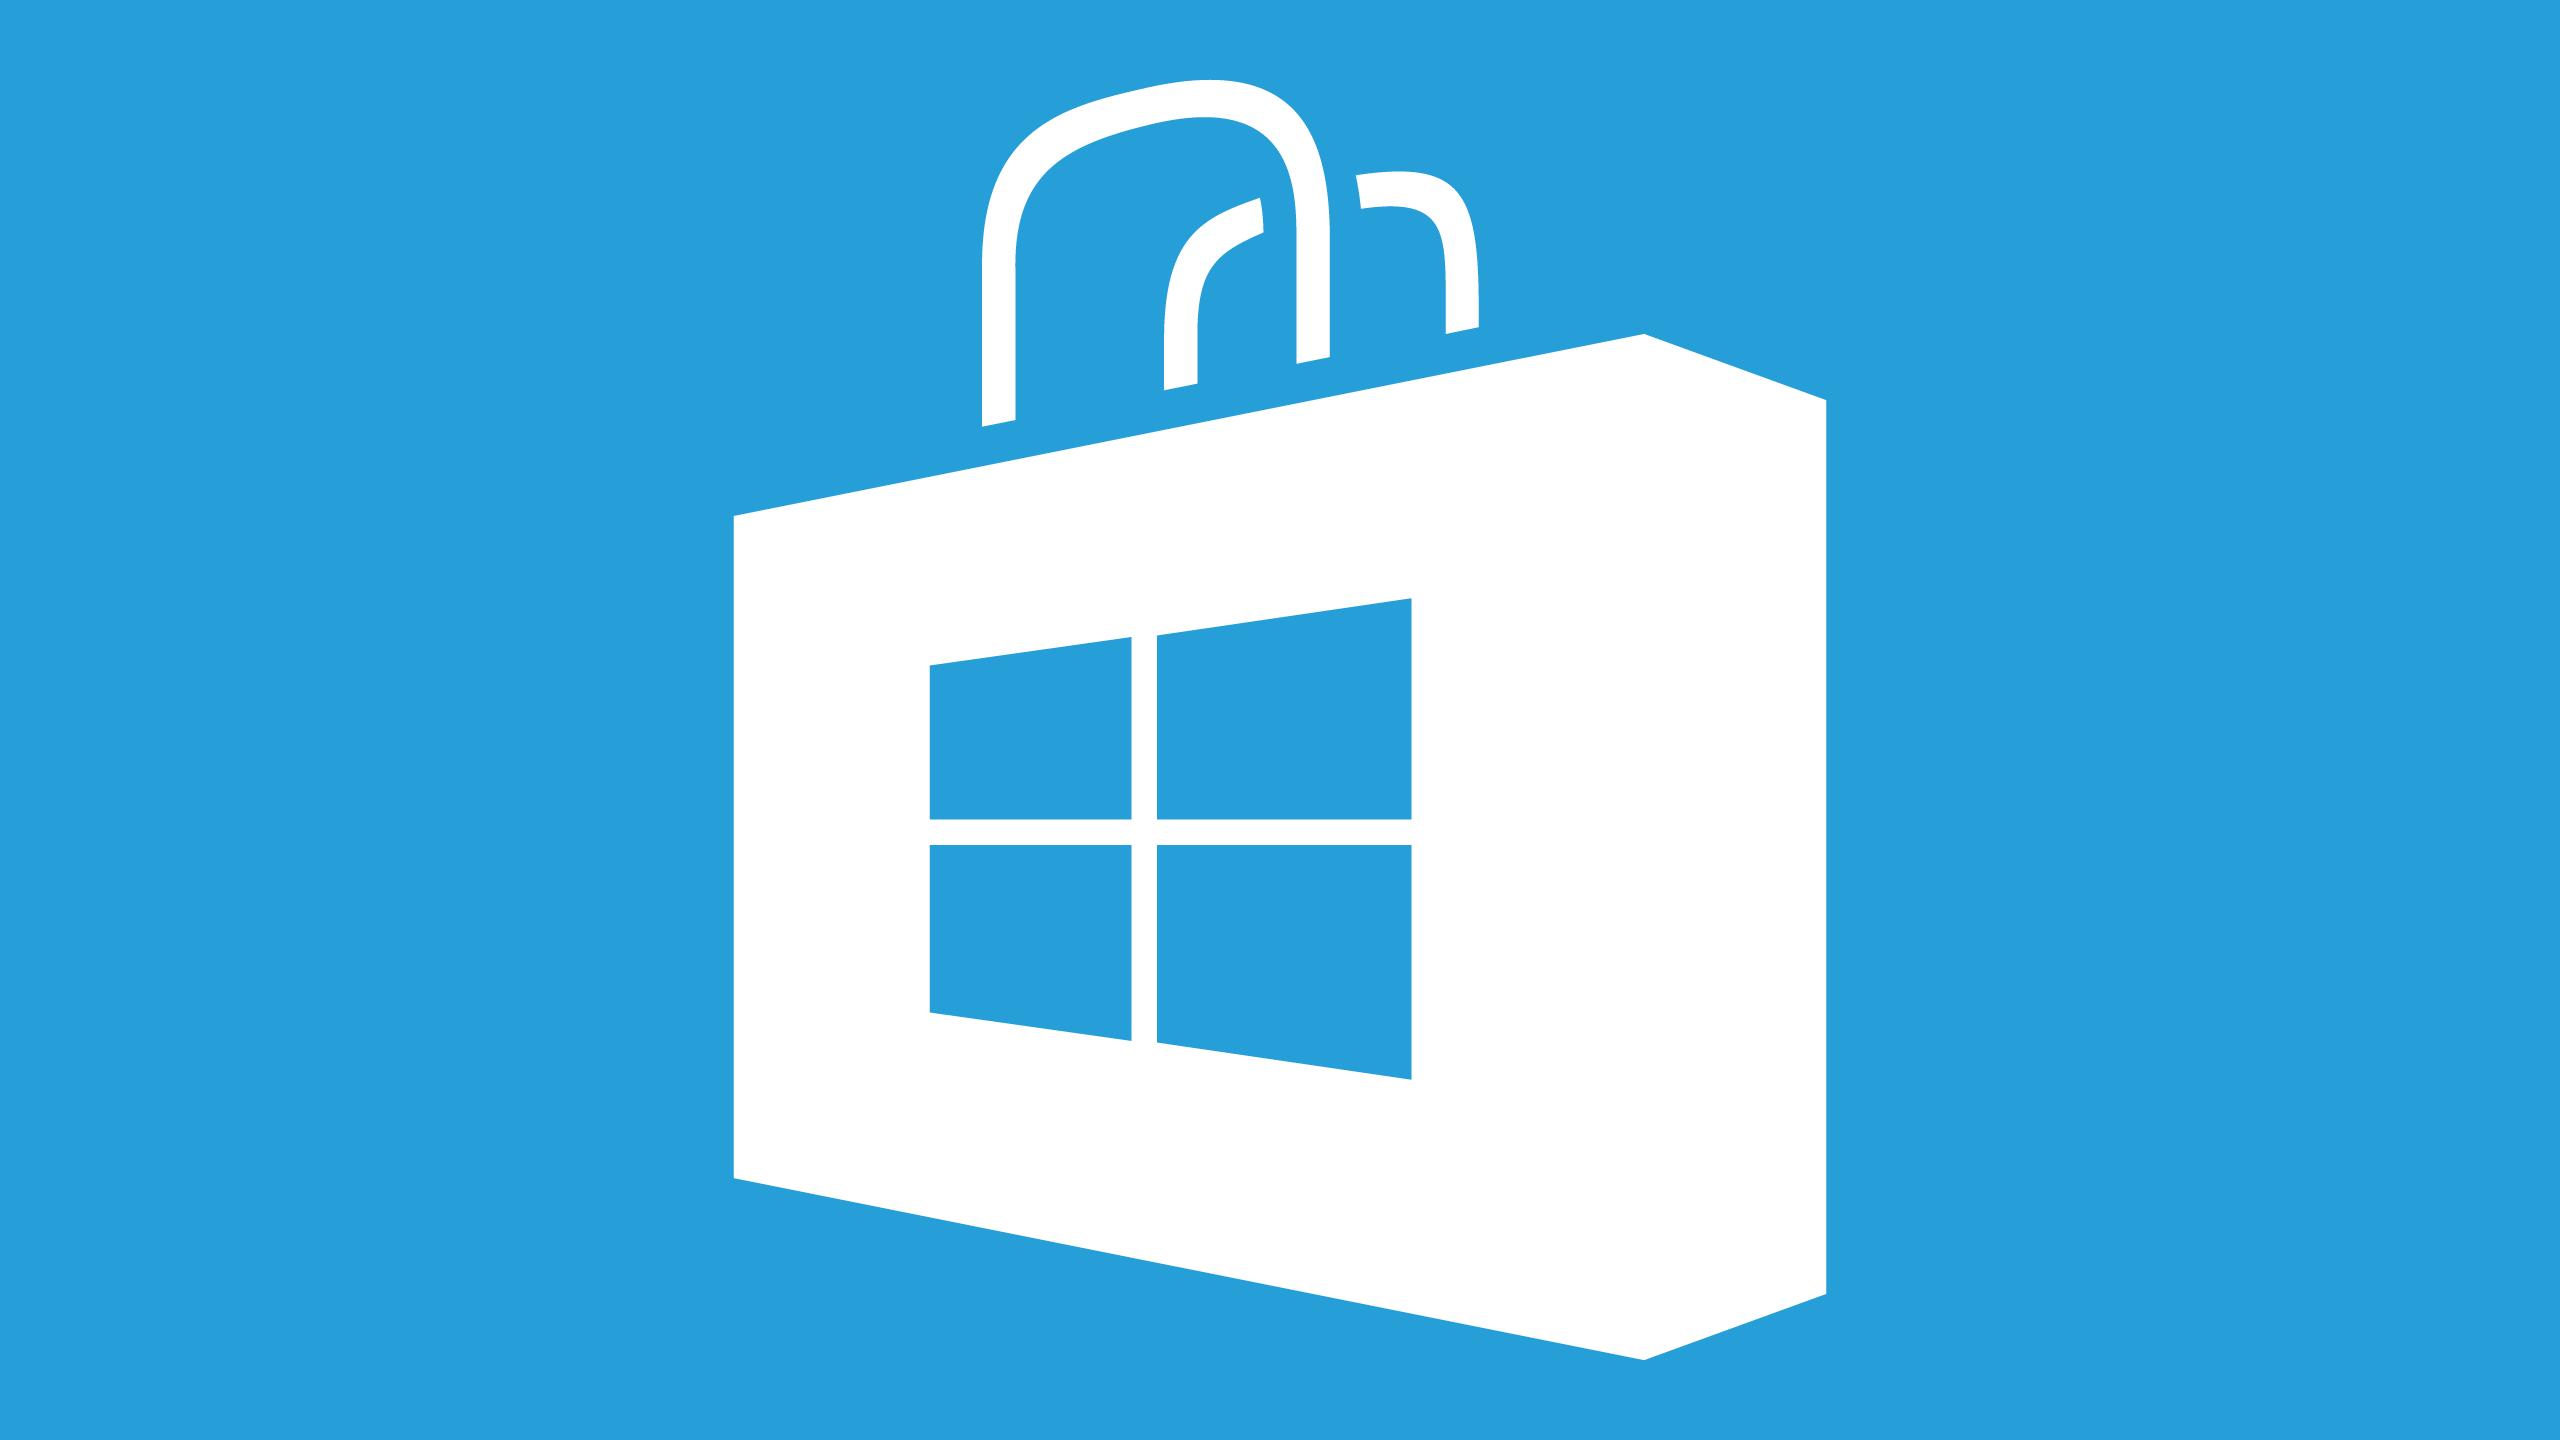 Microsoft объявила поддержку оффлайн-режима для игр наWindows 10